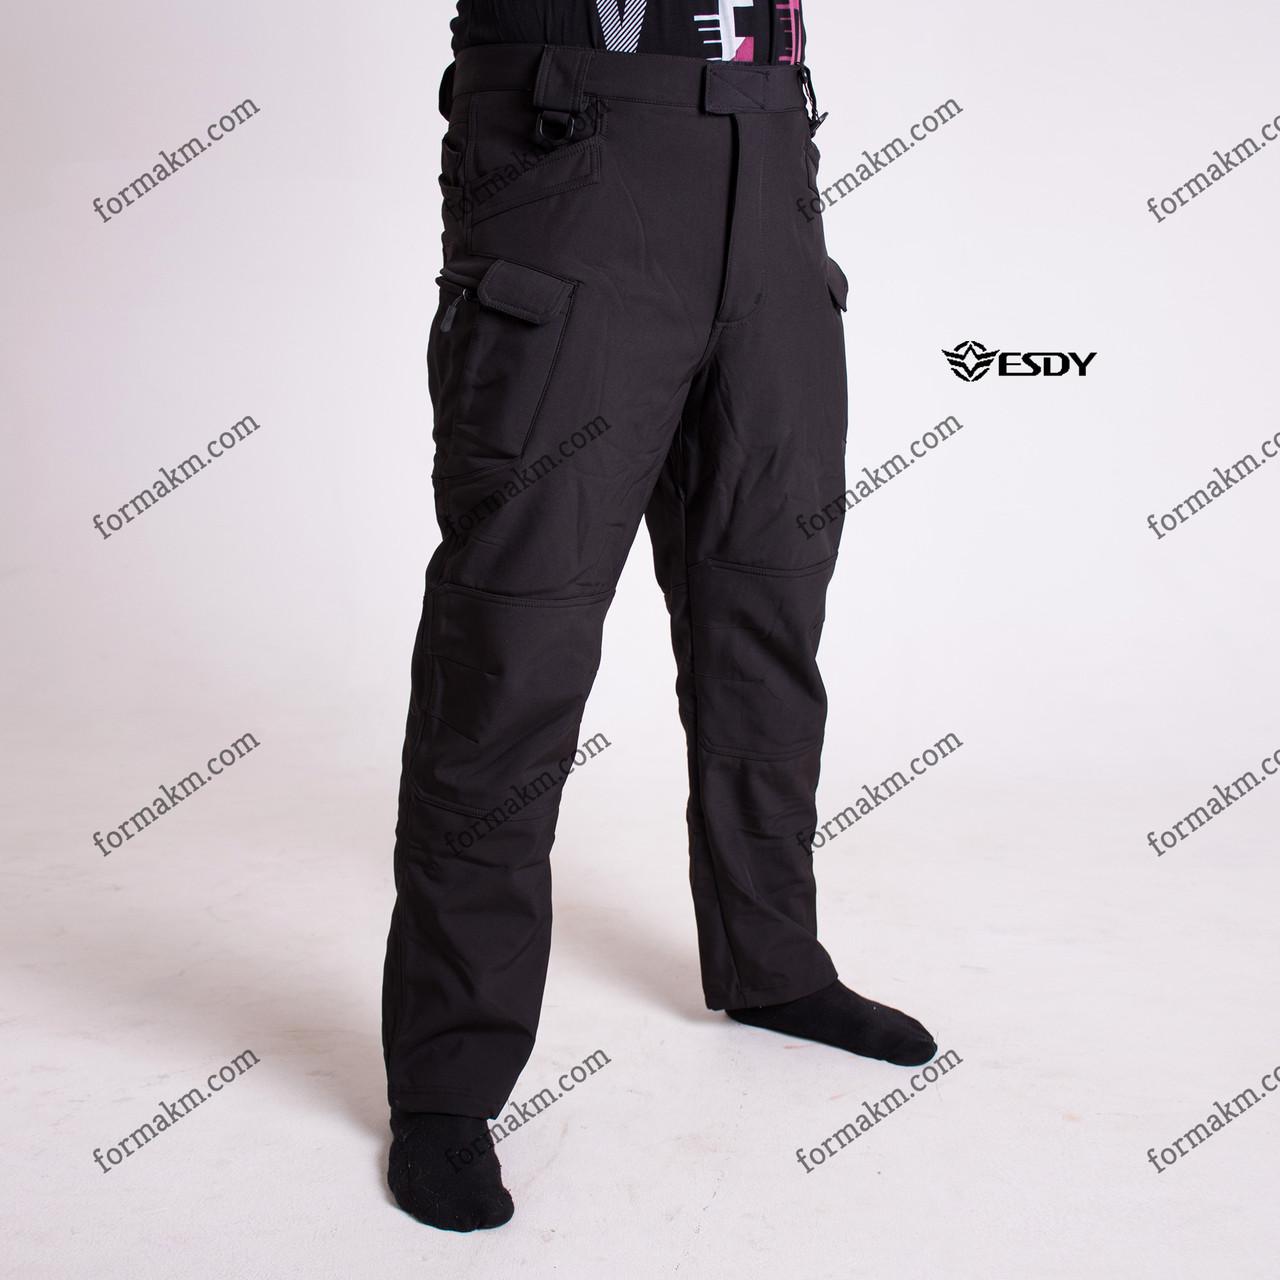 Тактические штаны Softshell Esdy Pro Черные